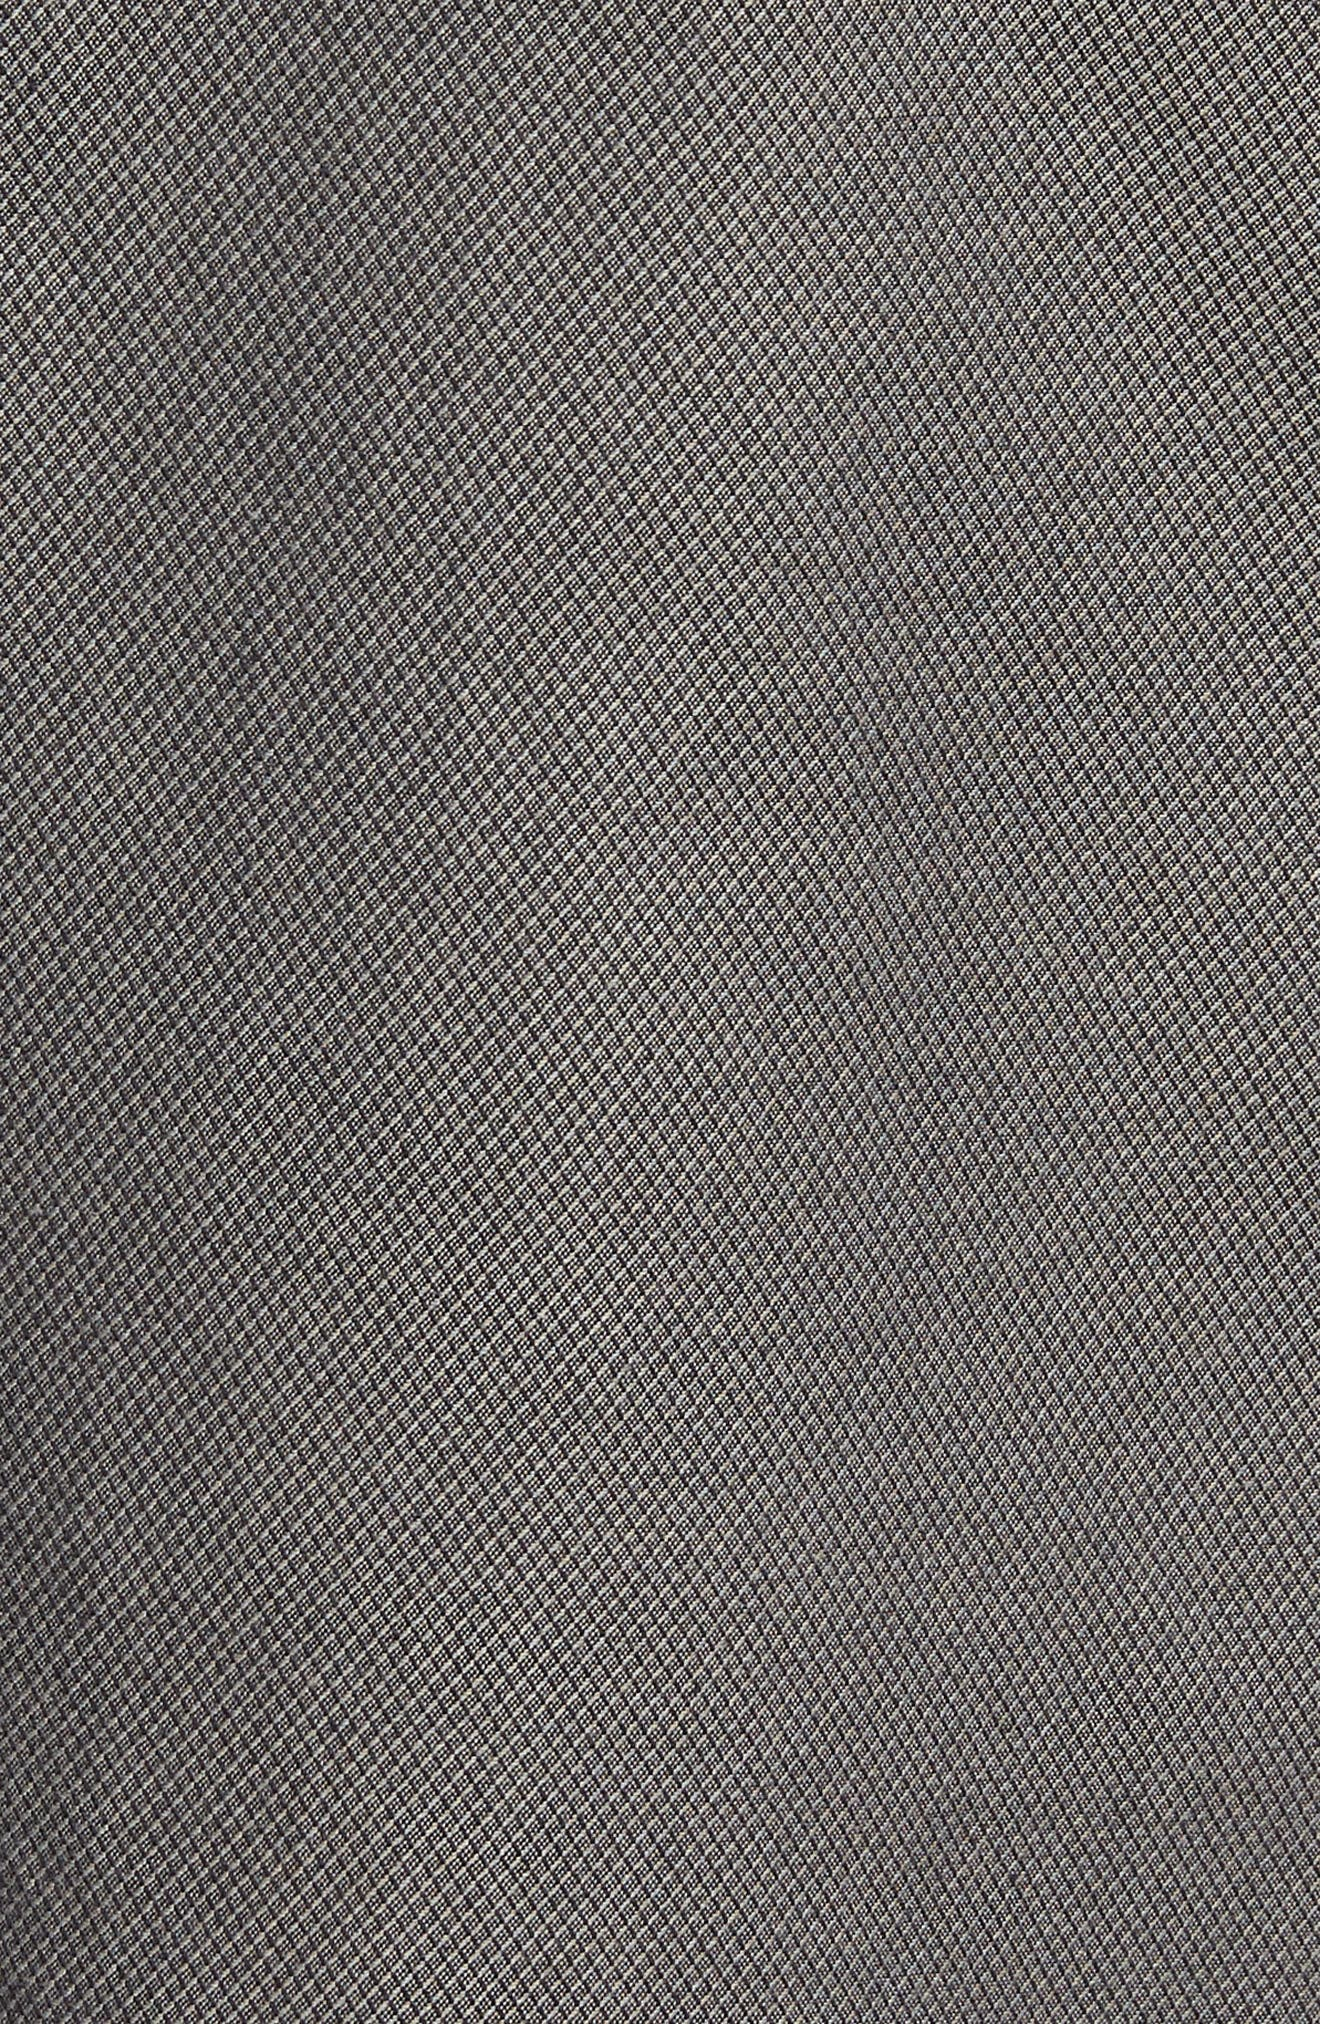 Army Bay Regular Fit Shorts,                             Alternate thumbnail 5, color,                             Granite